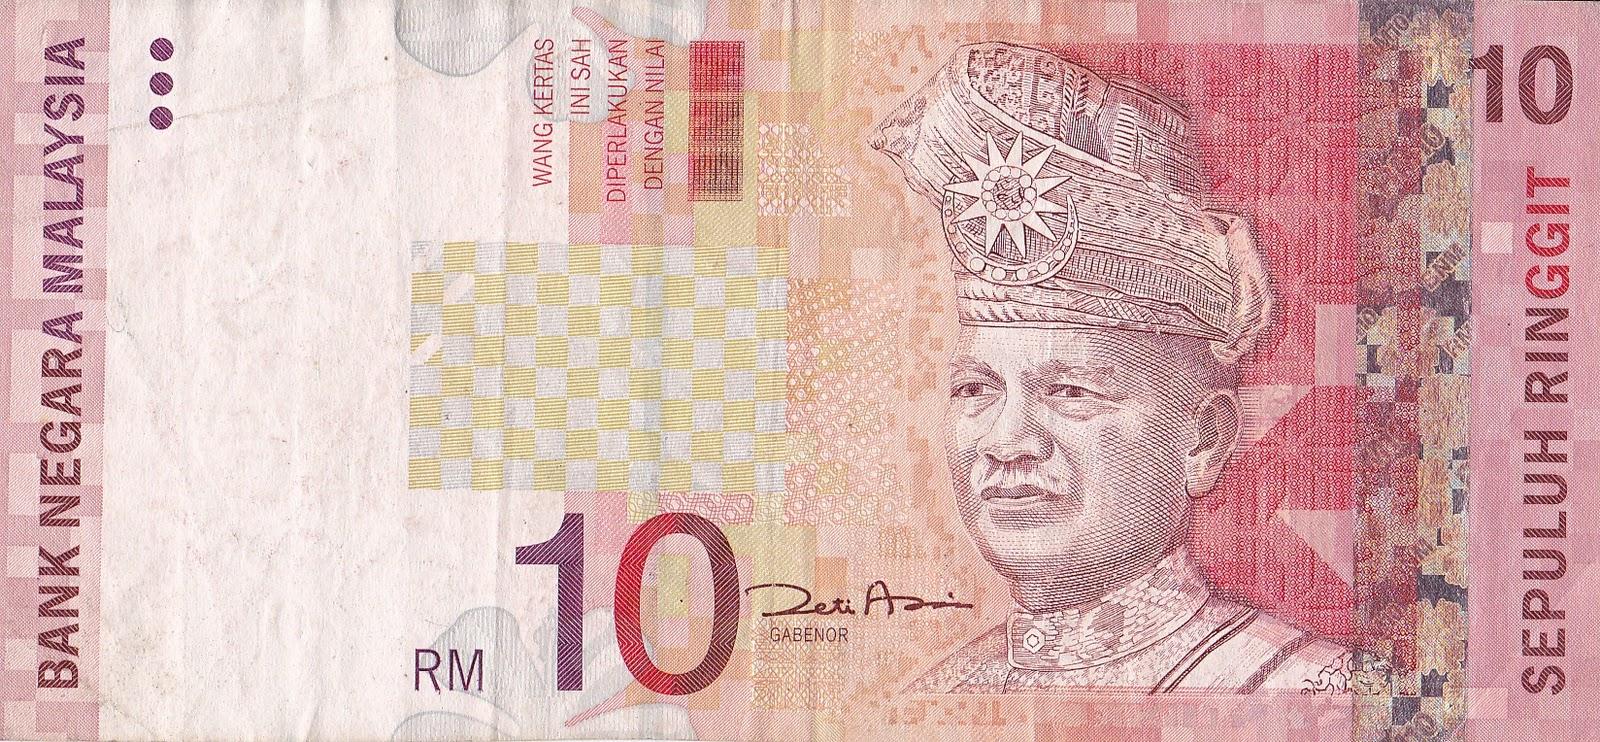 RM10+LOW+NUMBER+A Tawaran untuk jadi PENULIS JEMPUTAN blog HAZMANFADZIL.COM